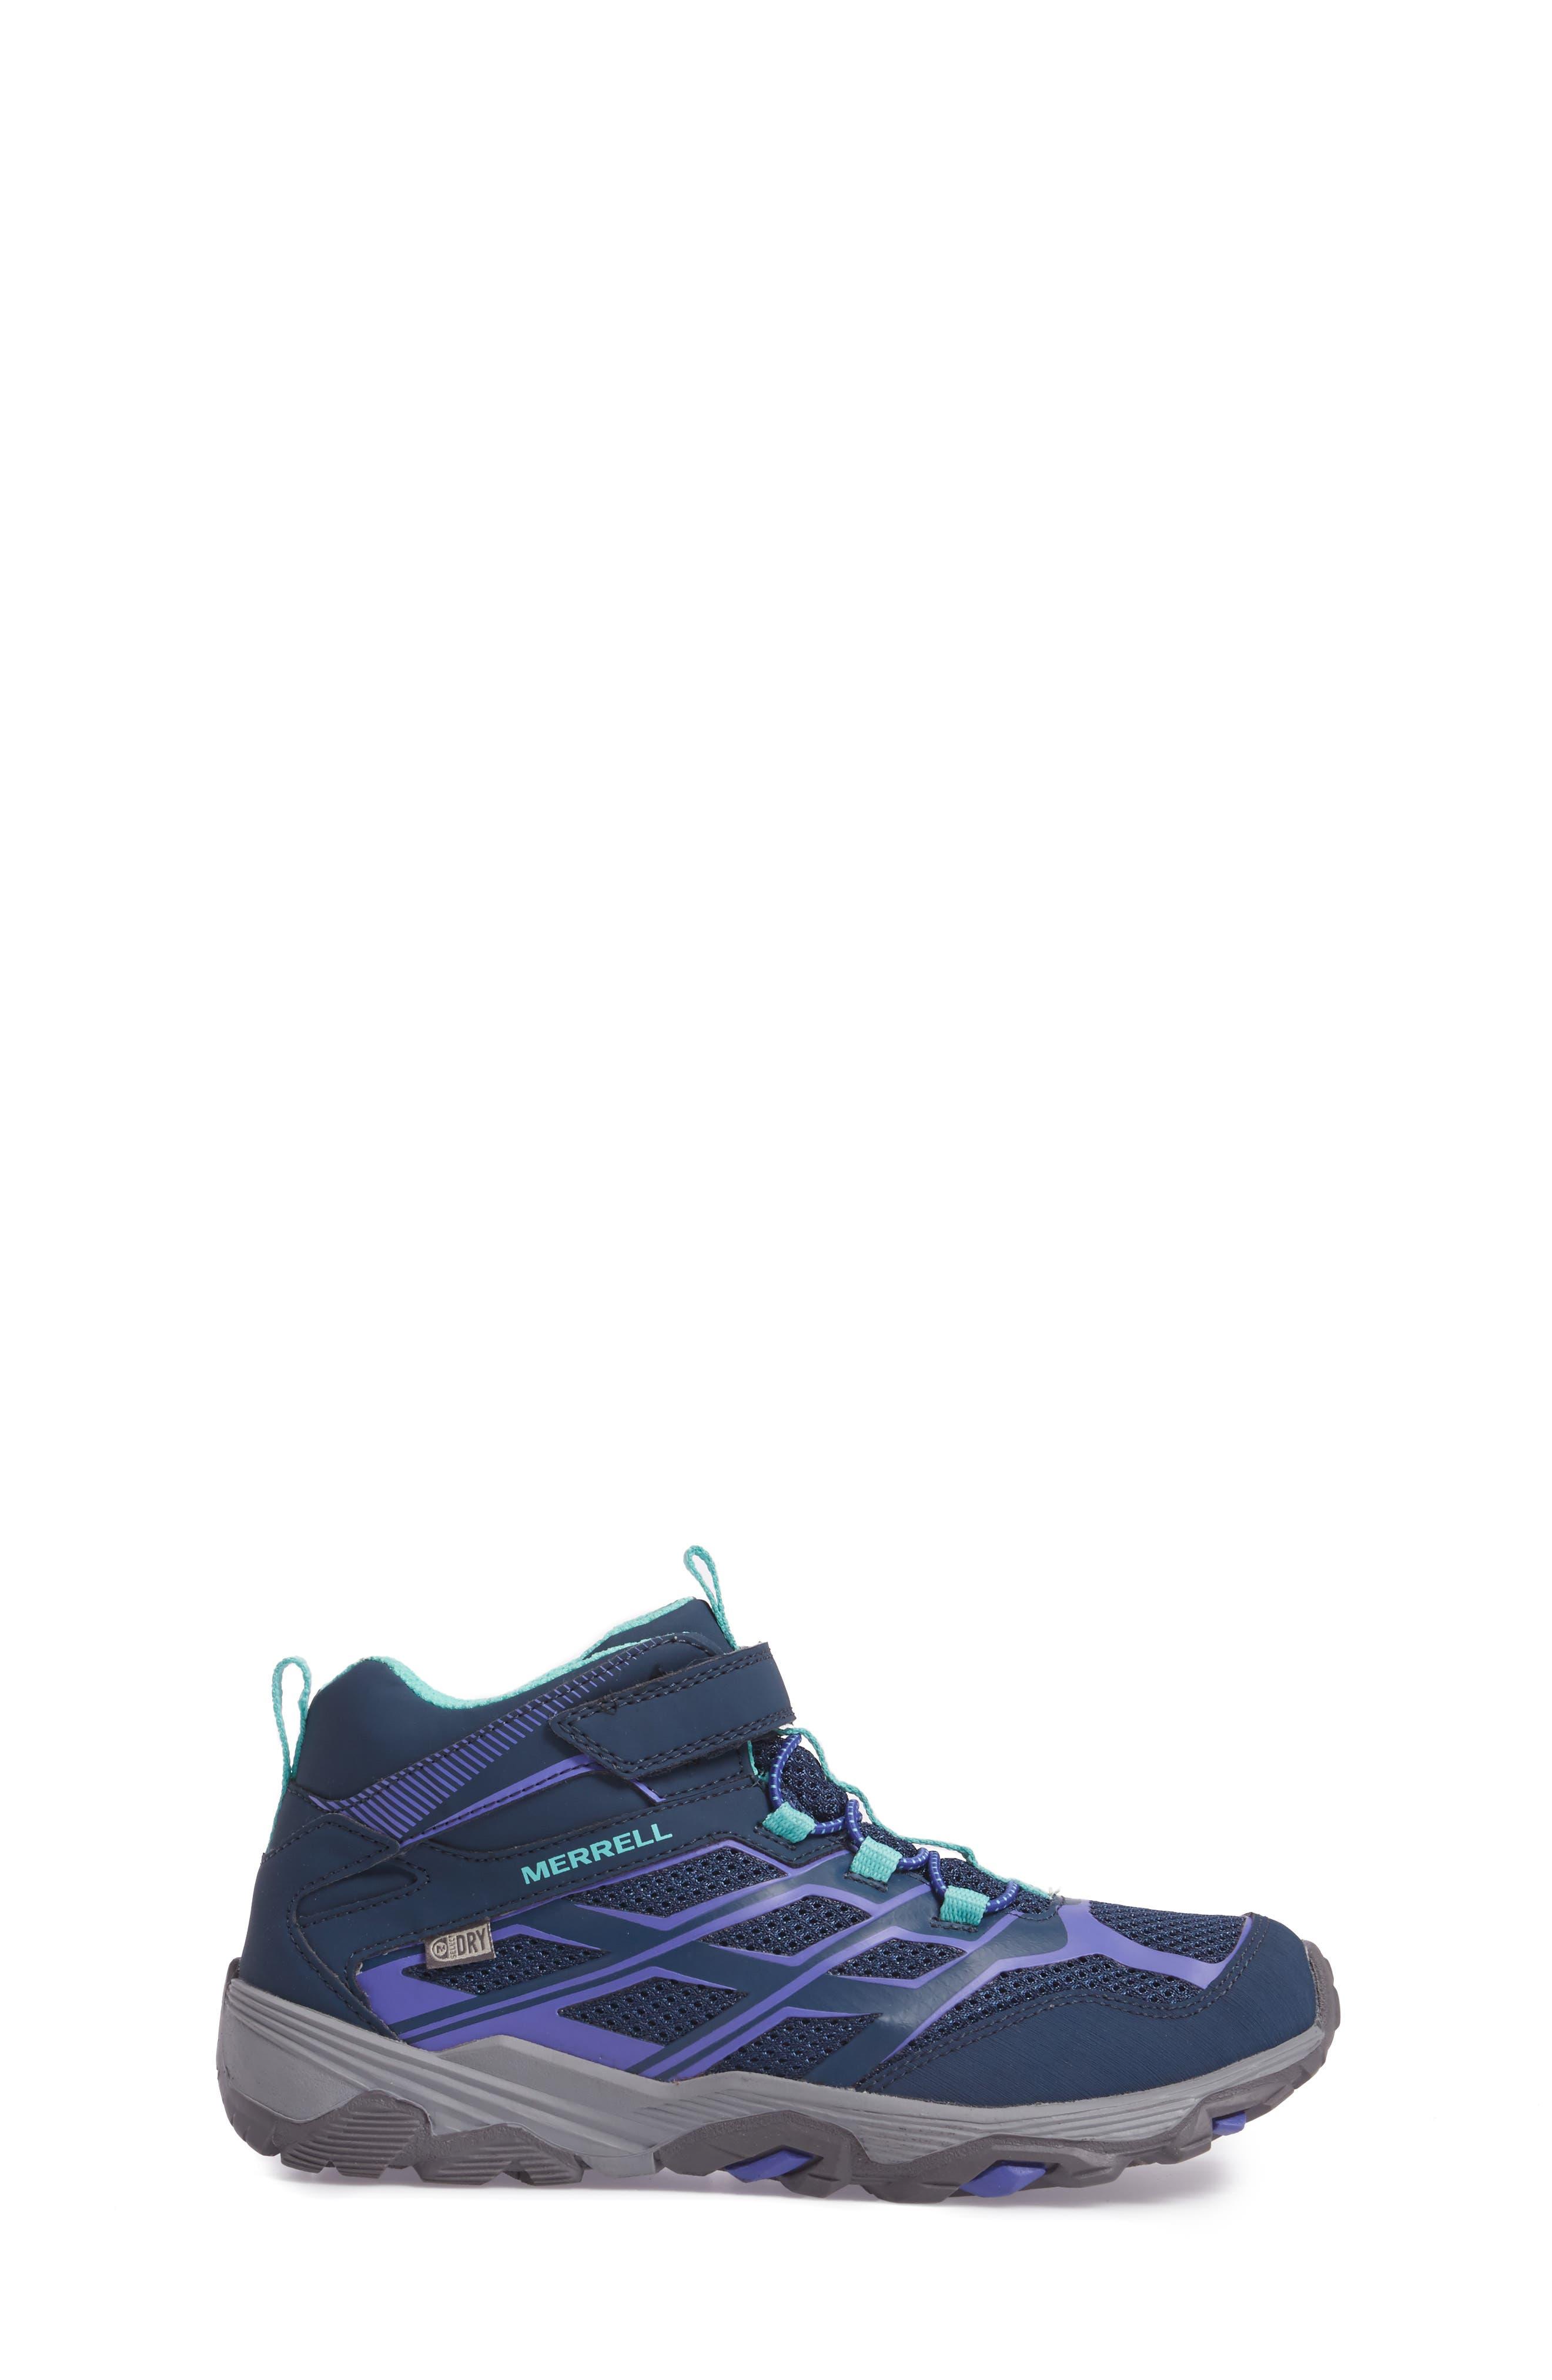 Alternate Image 3  - Merrell Moab FST Polar Mid Insulated Waterproof Sneaker Boot (Baby, Walker, Toddler, Little Kid & Big Kid)